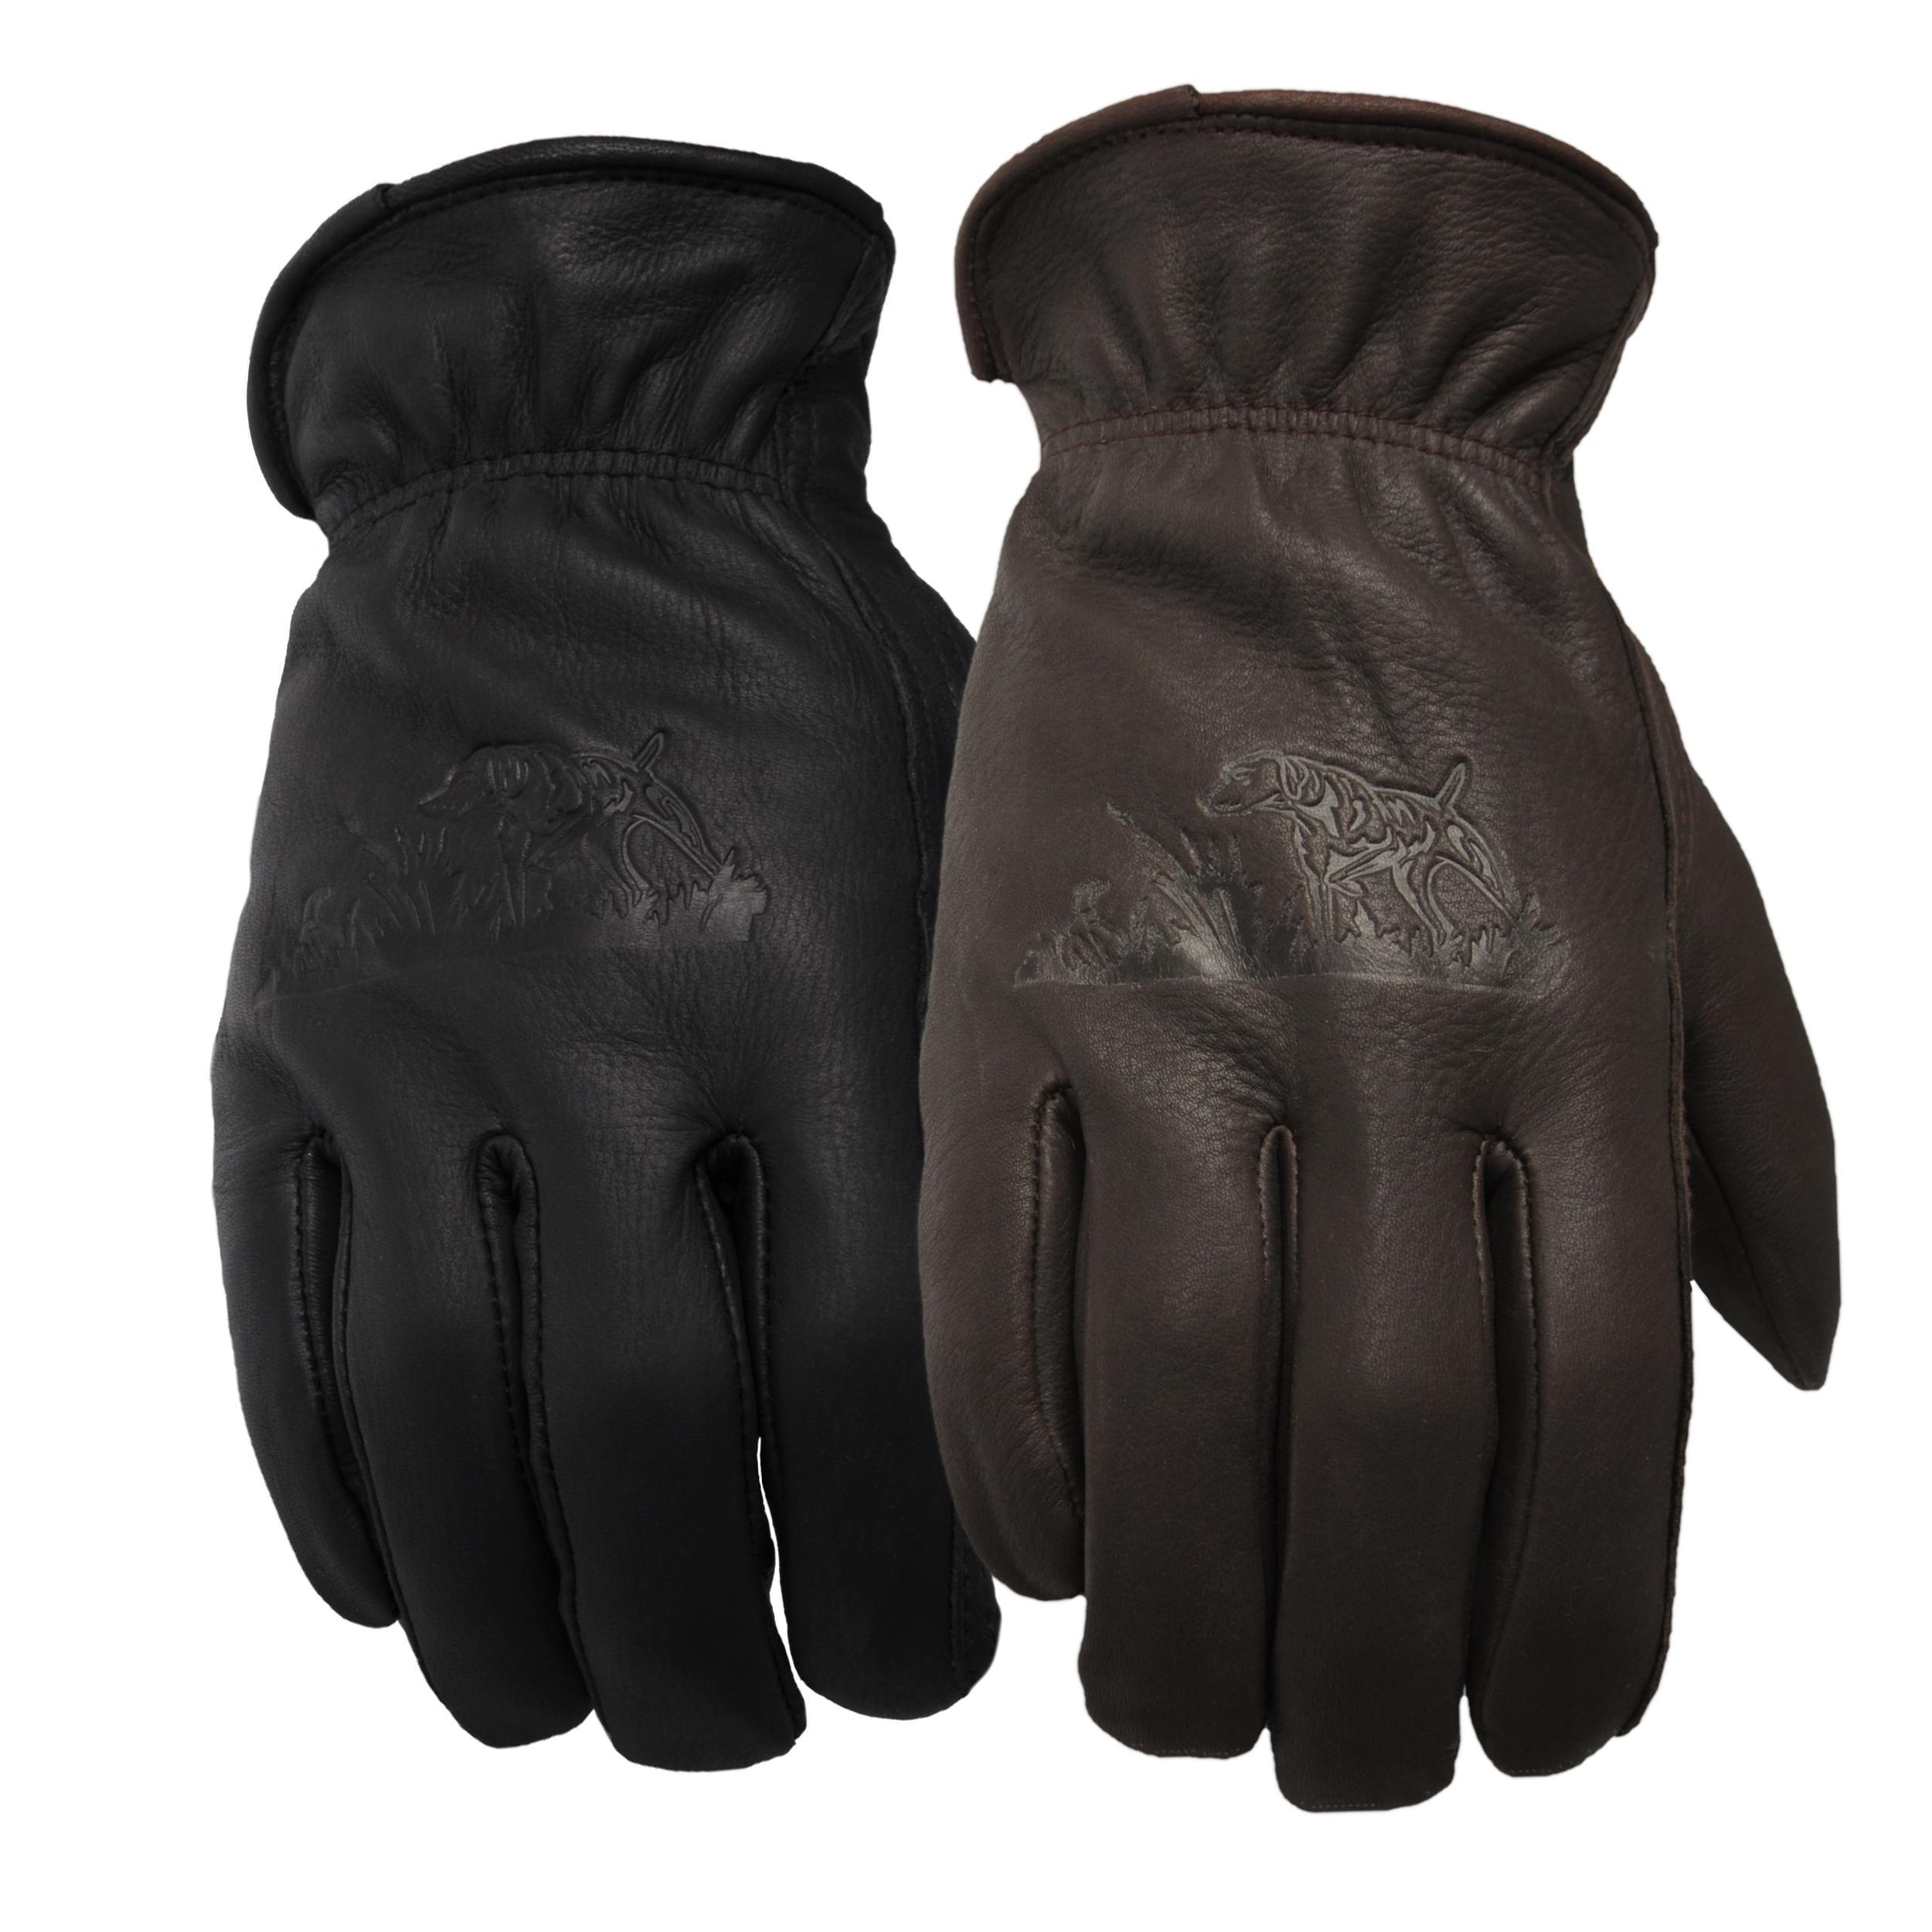 Daxx Men's Top Grain Deerskin Leather Bird Dog Print Lined Gloves